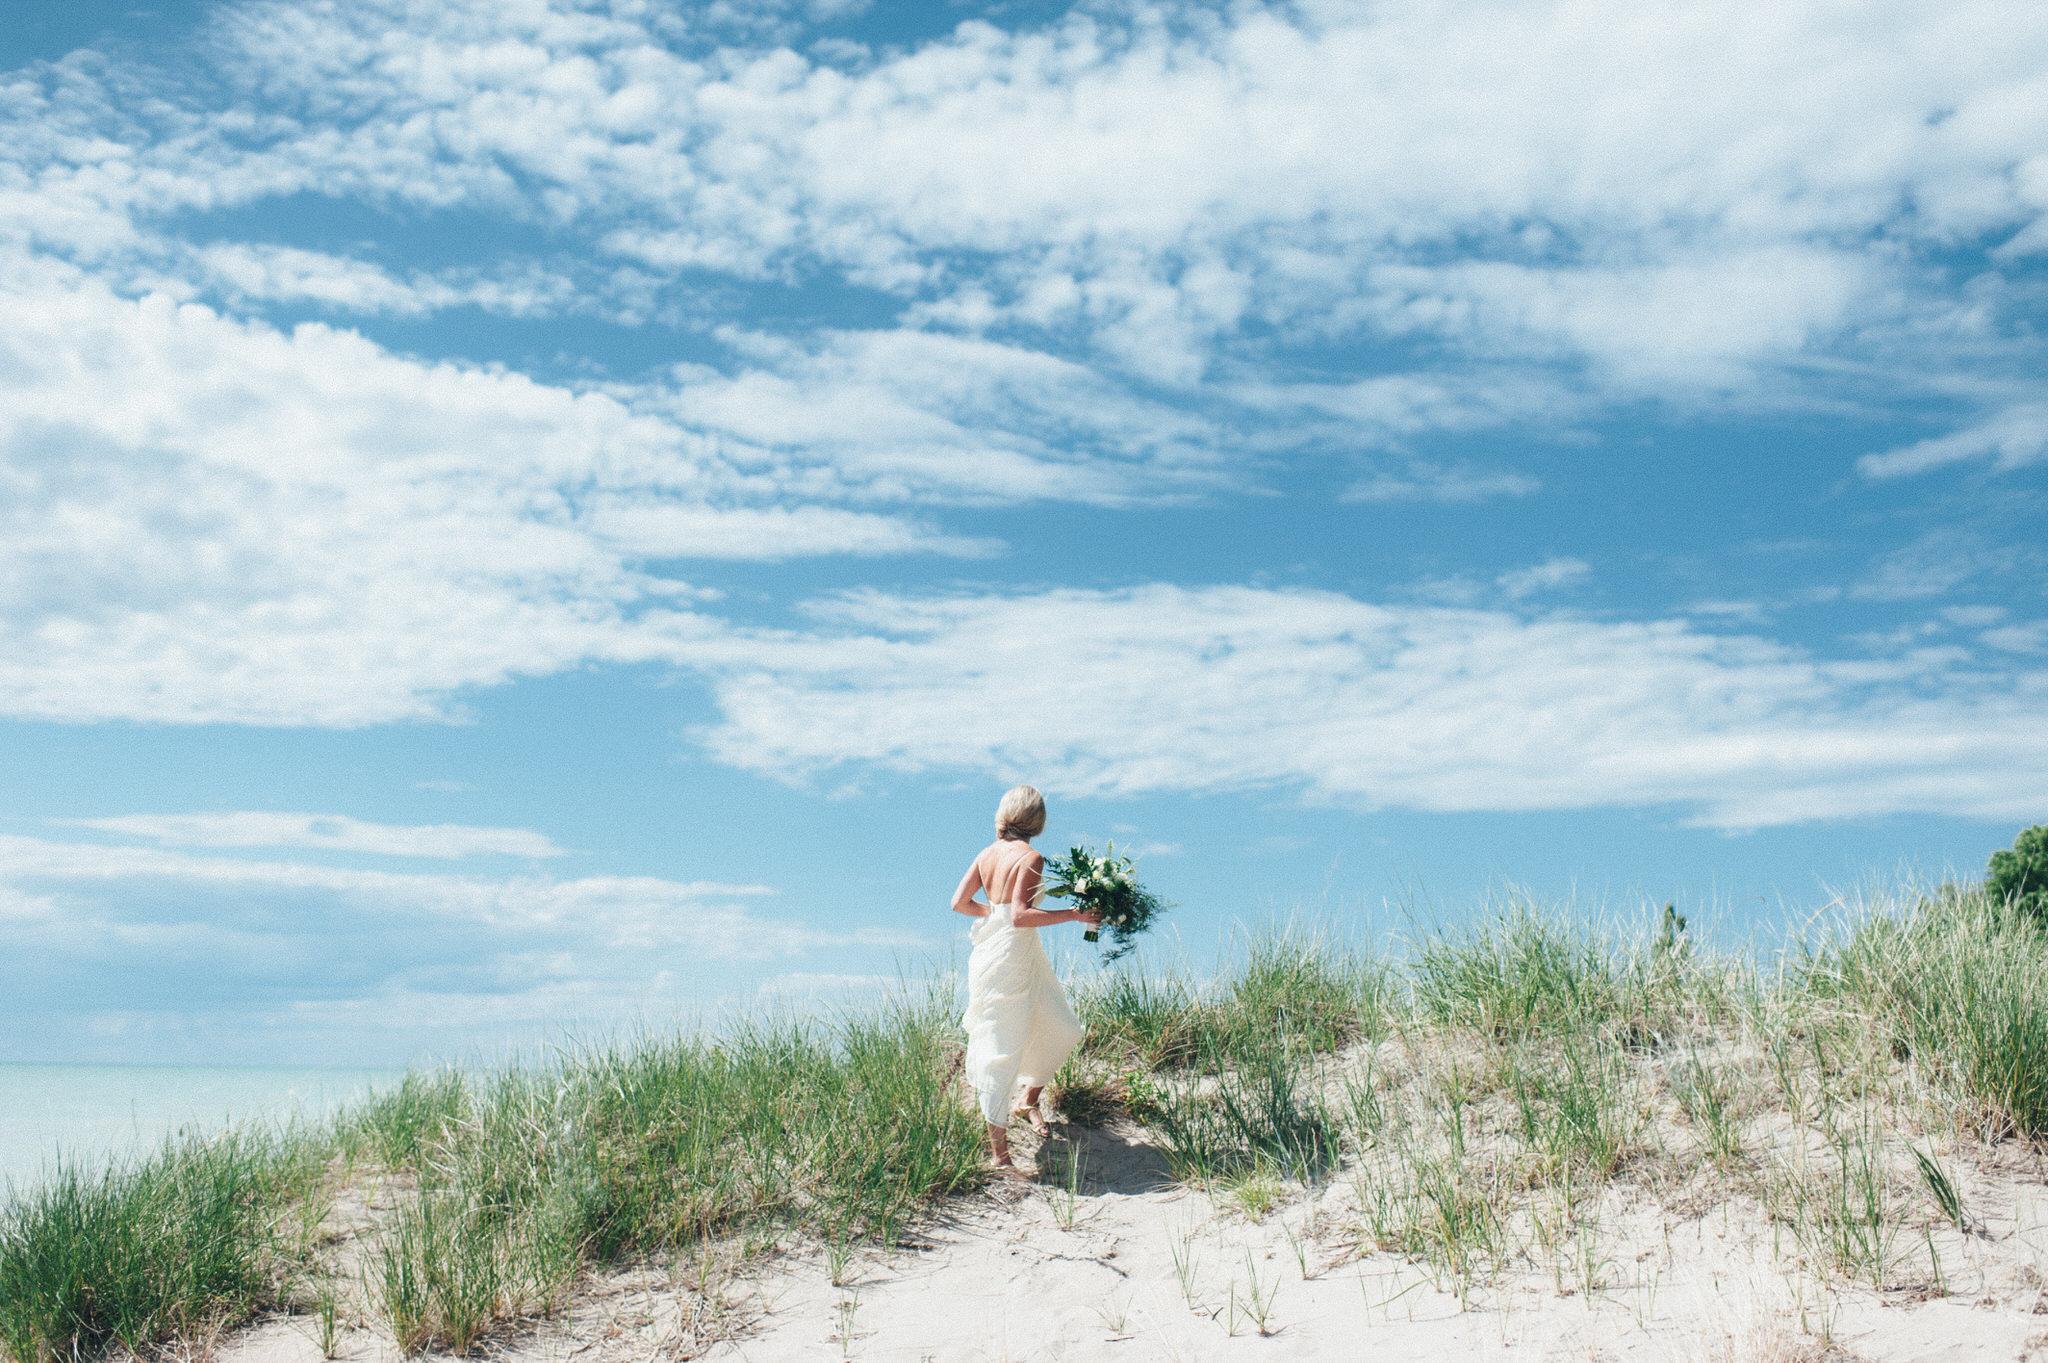 toronto wedding photography scarlet oneill045.JPG